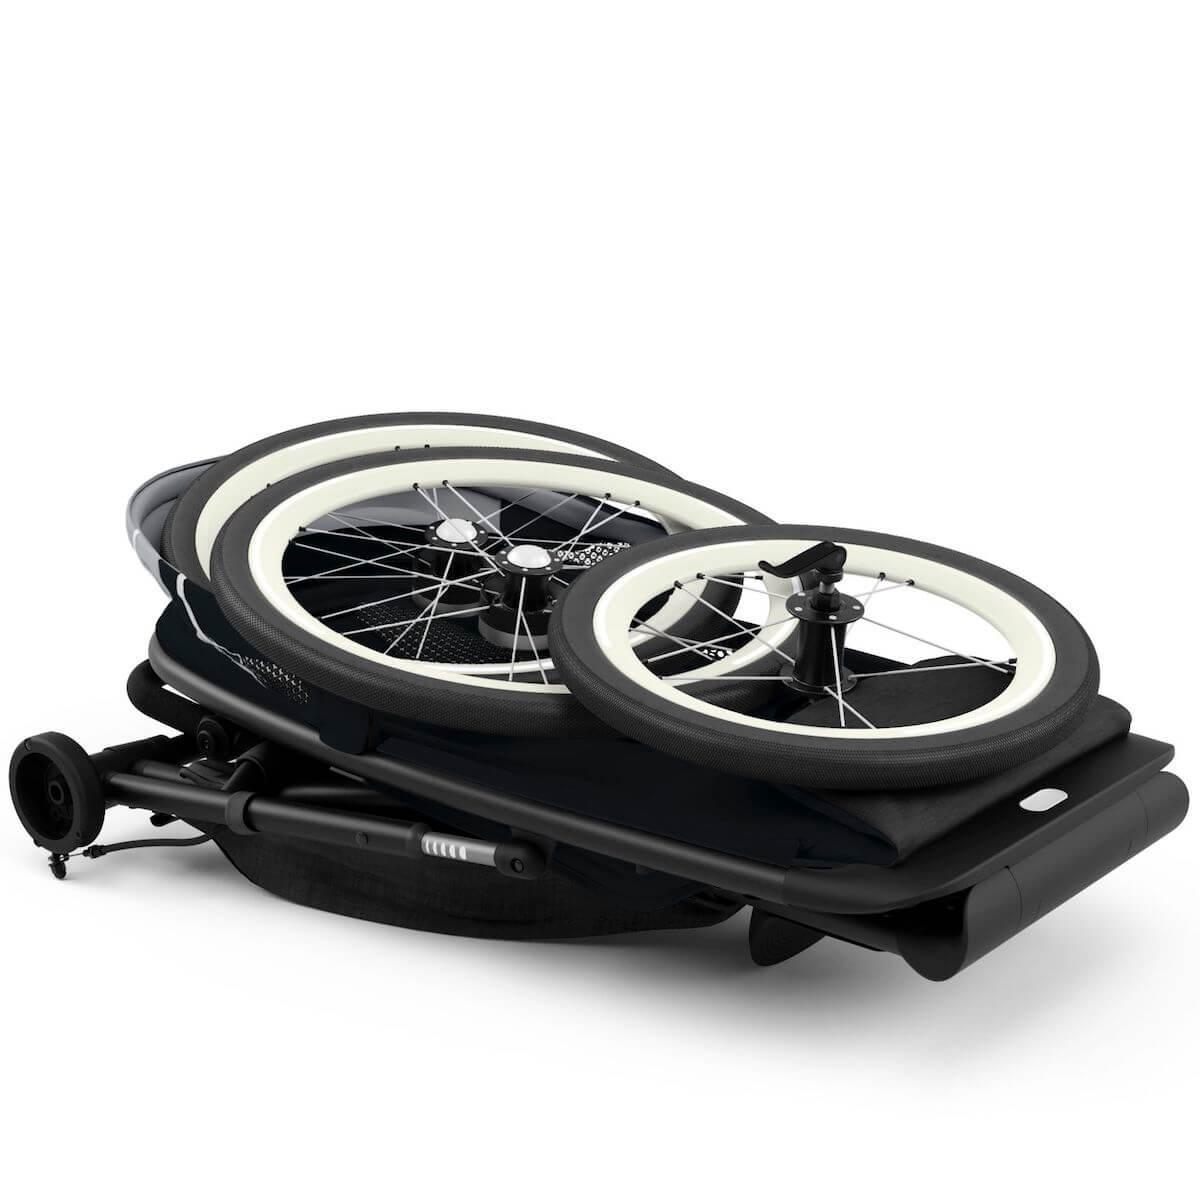 AVI carrito SPORT GOODS Cybex negro-All Black